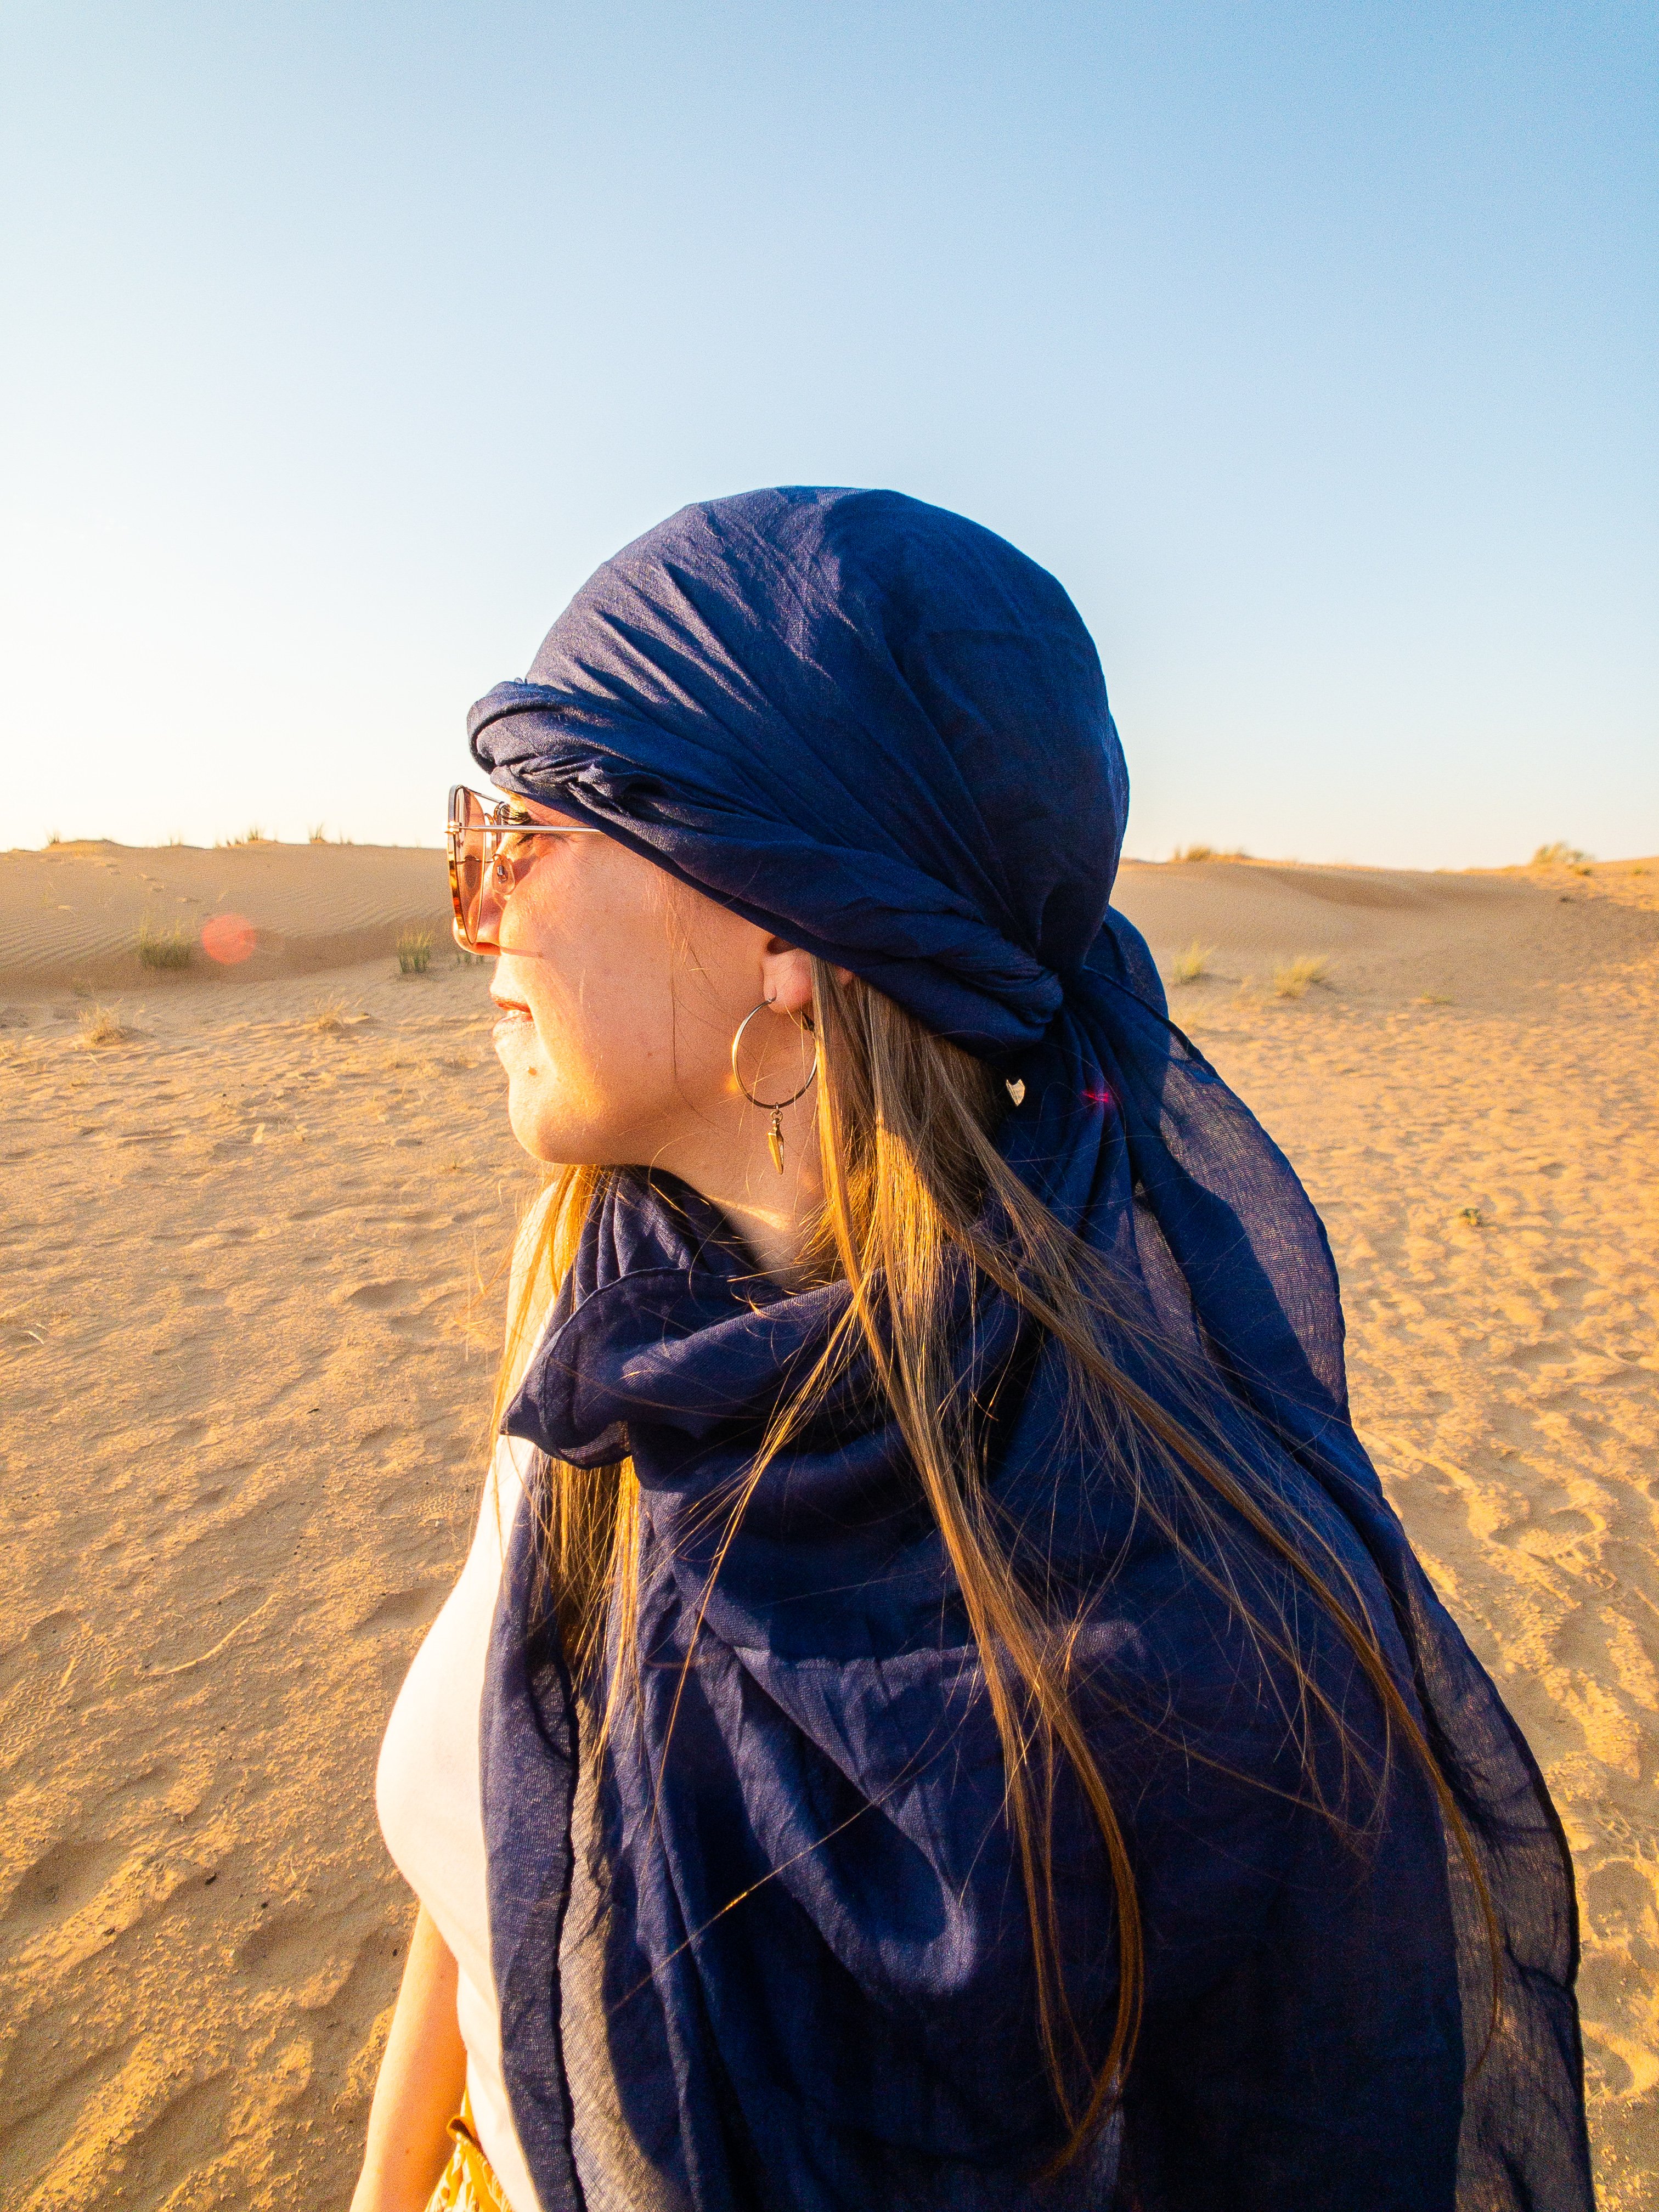 Platinum Heritage Desert Camel Ride Tours Dubai | What to Wear in Dubai